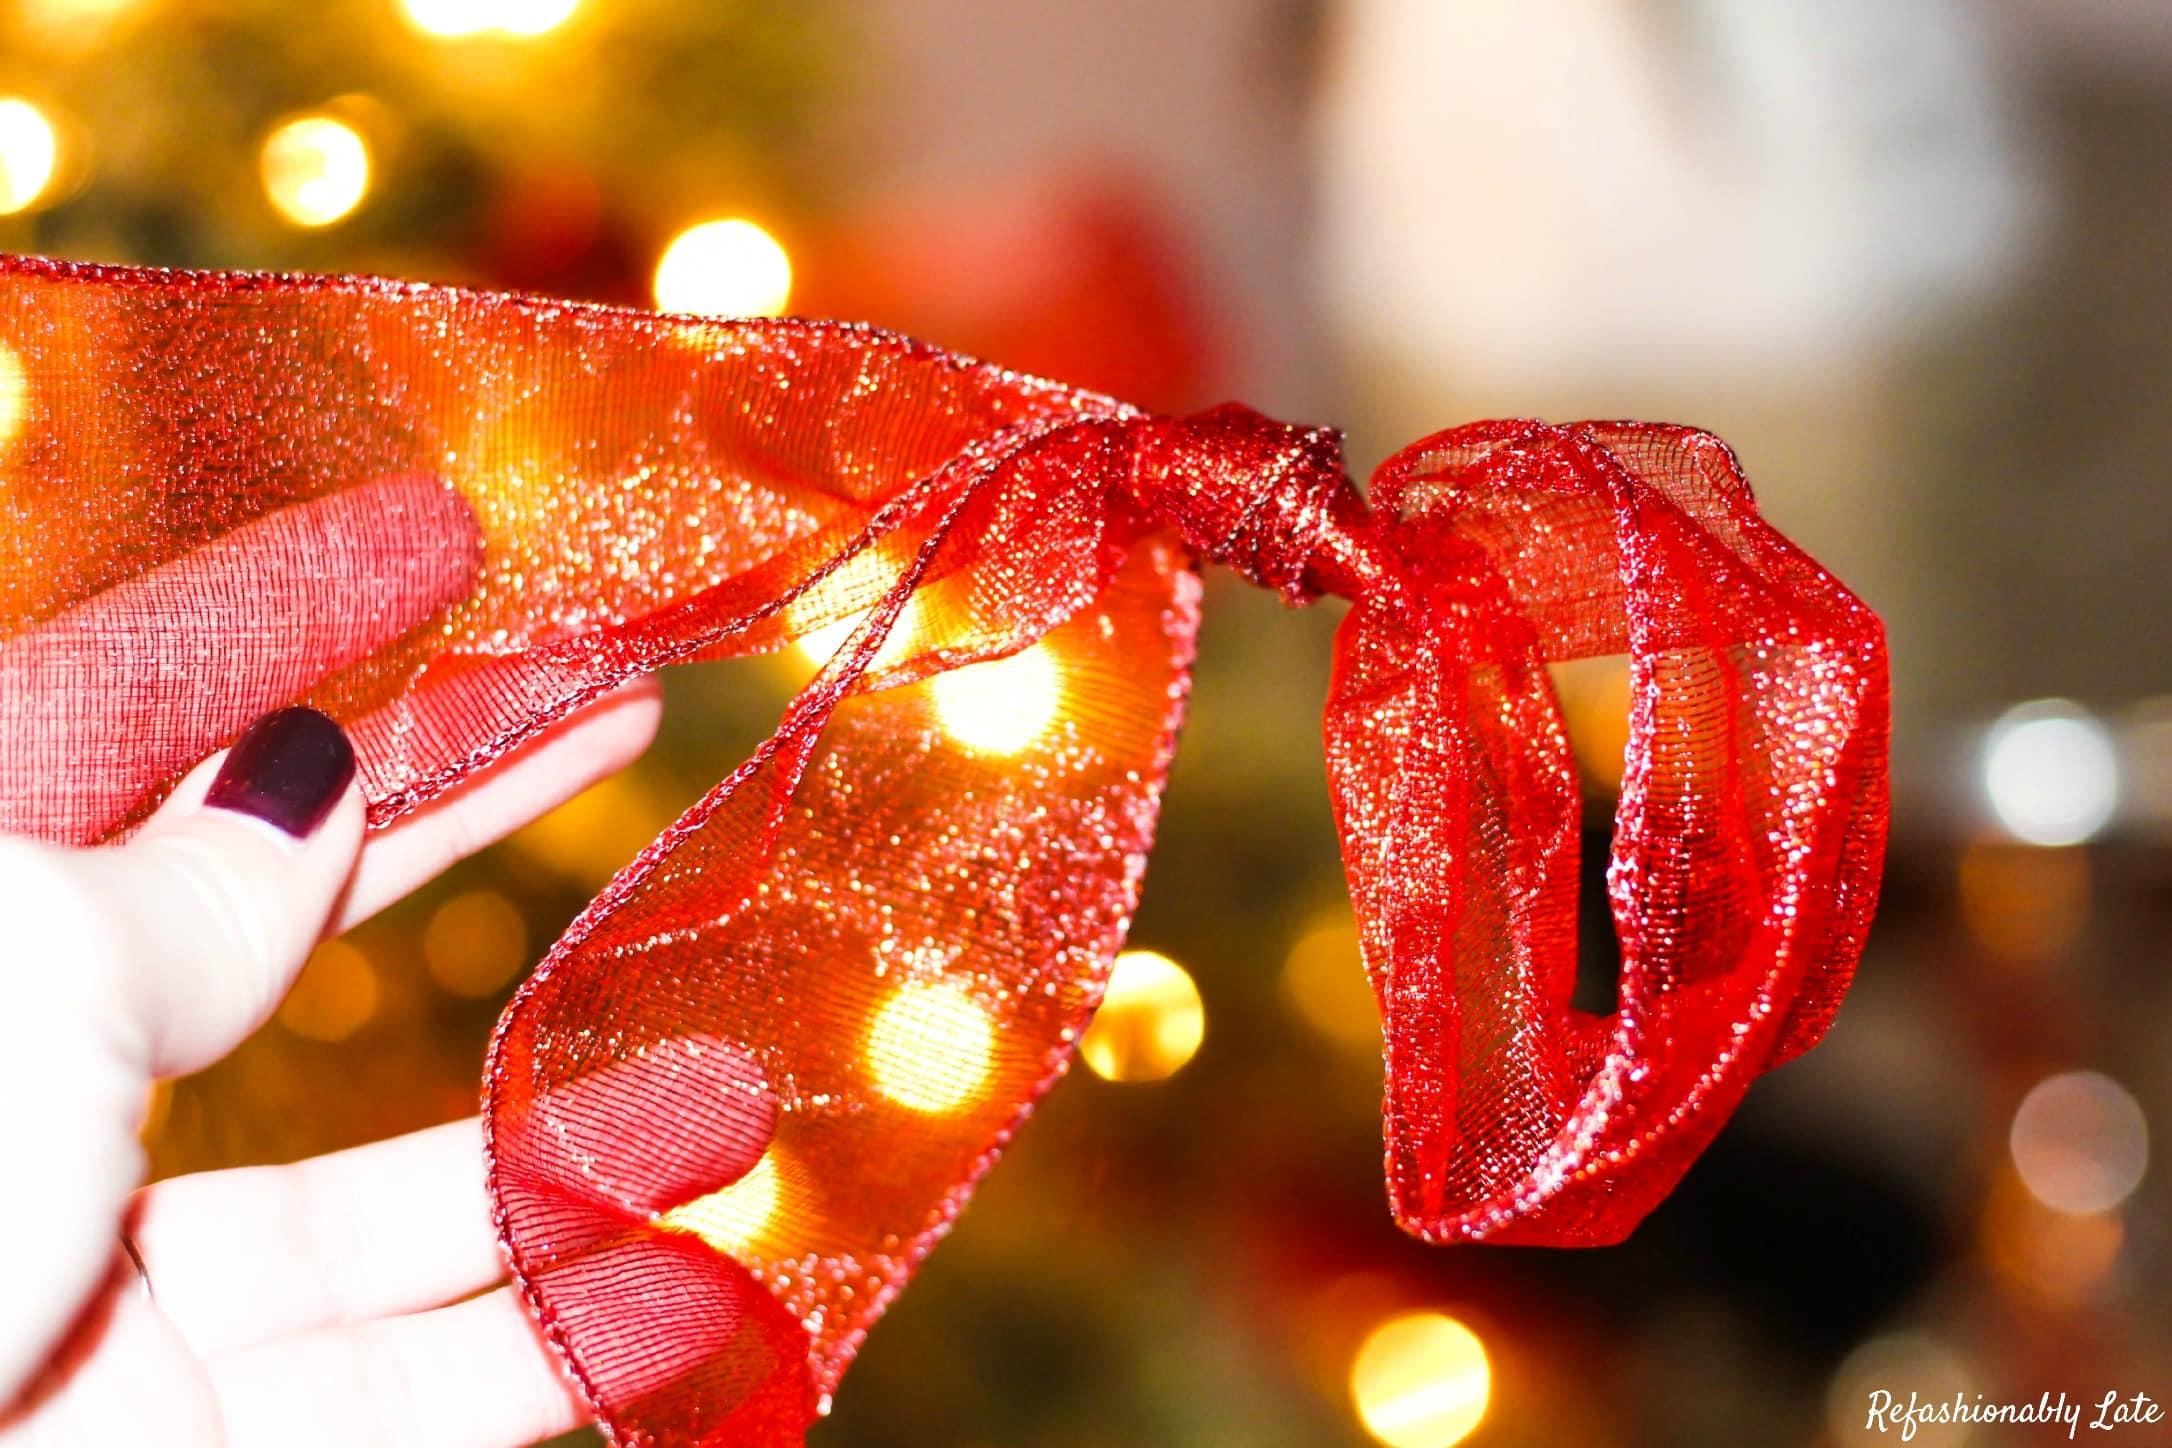 Winter Wonderhome - Refashionably Late Christmas Home Tour - www.refashionablylate.com